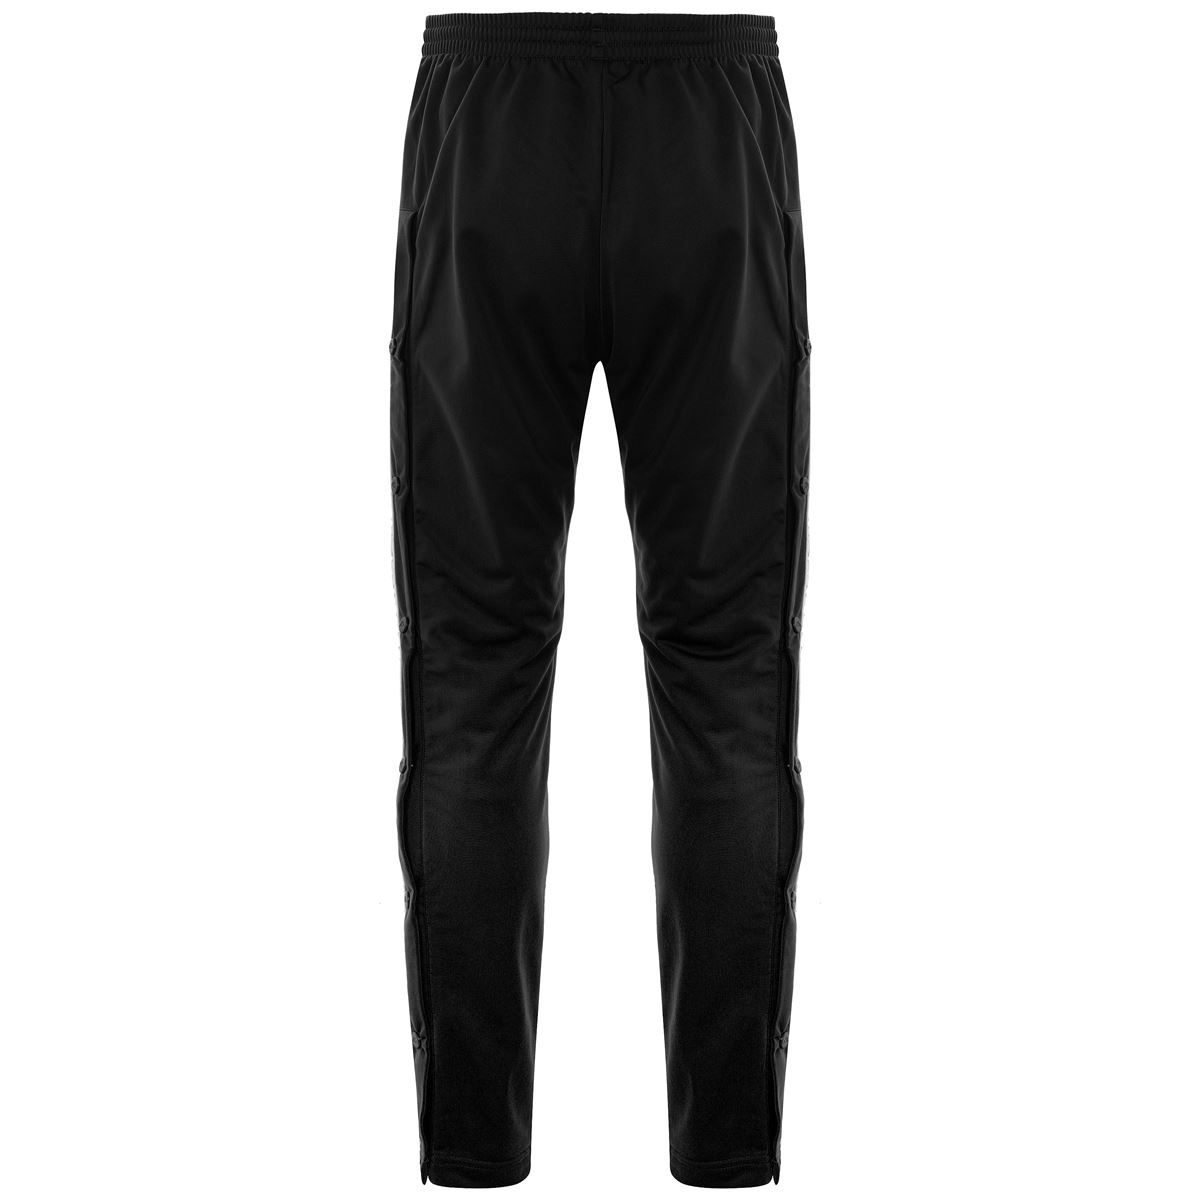 Kappa Pants Man 222 BANDA ASTORIA SNAPS SLIM SPORT STREET Sport Trousers